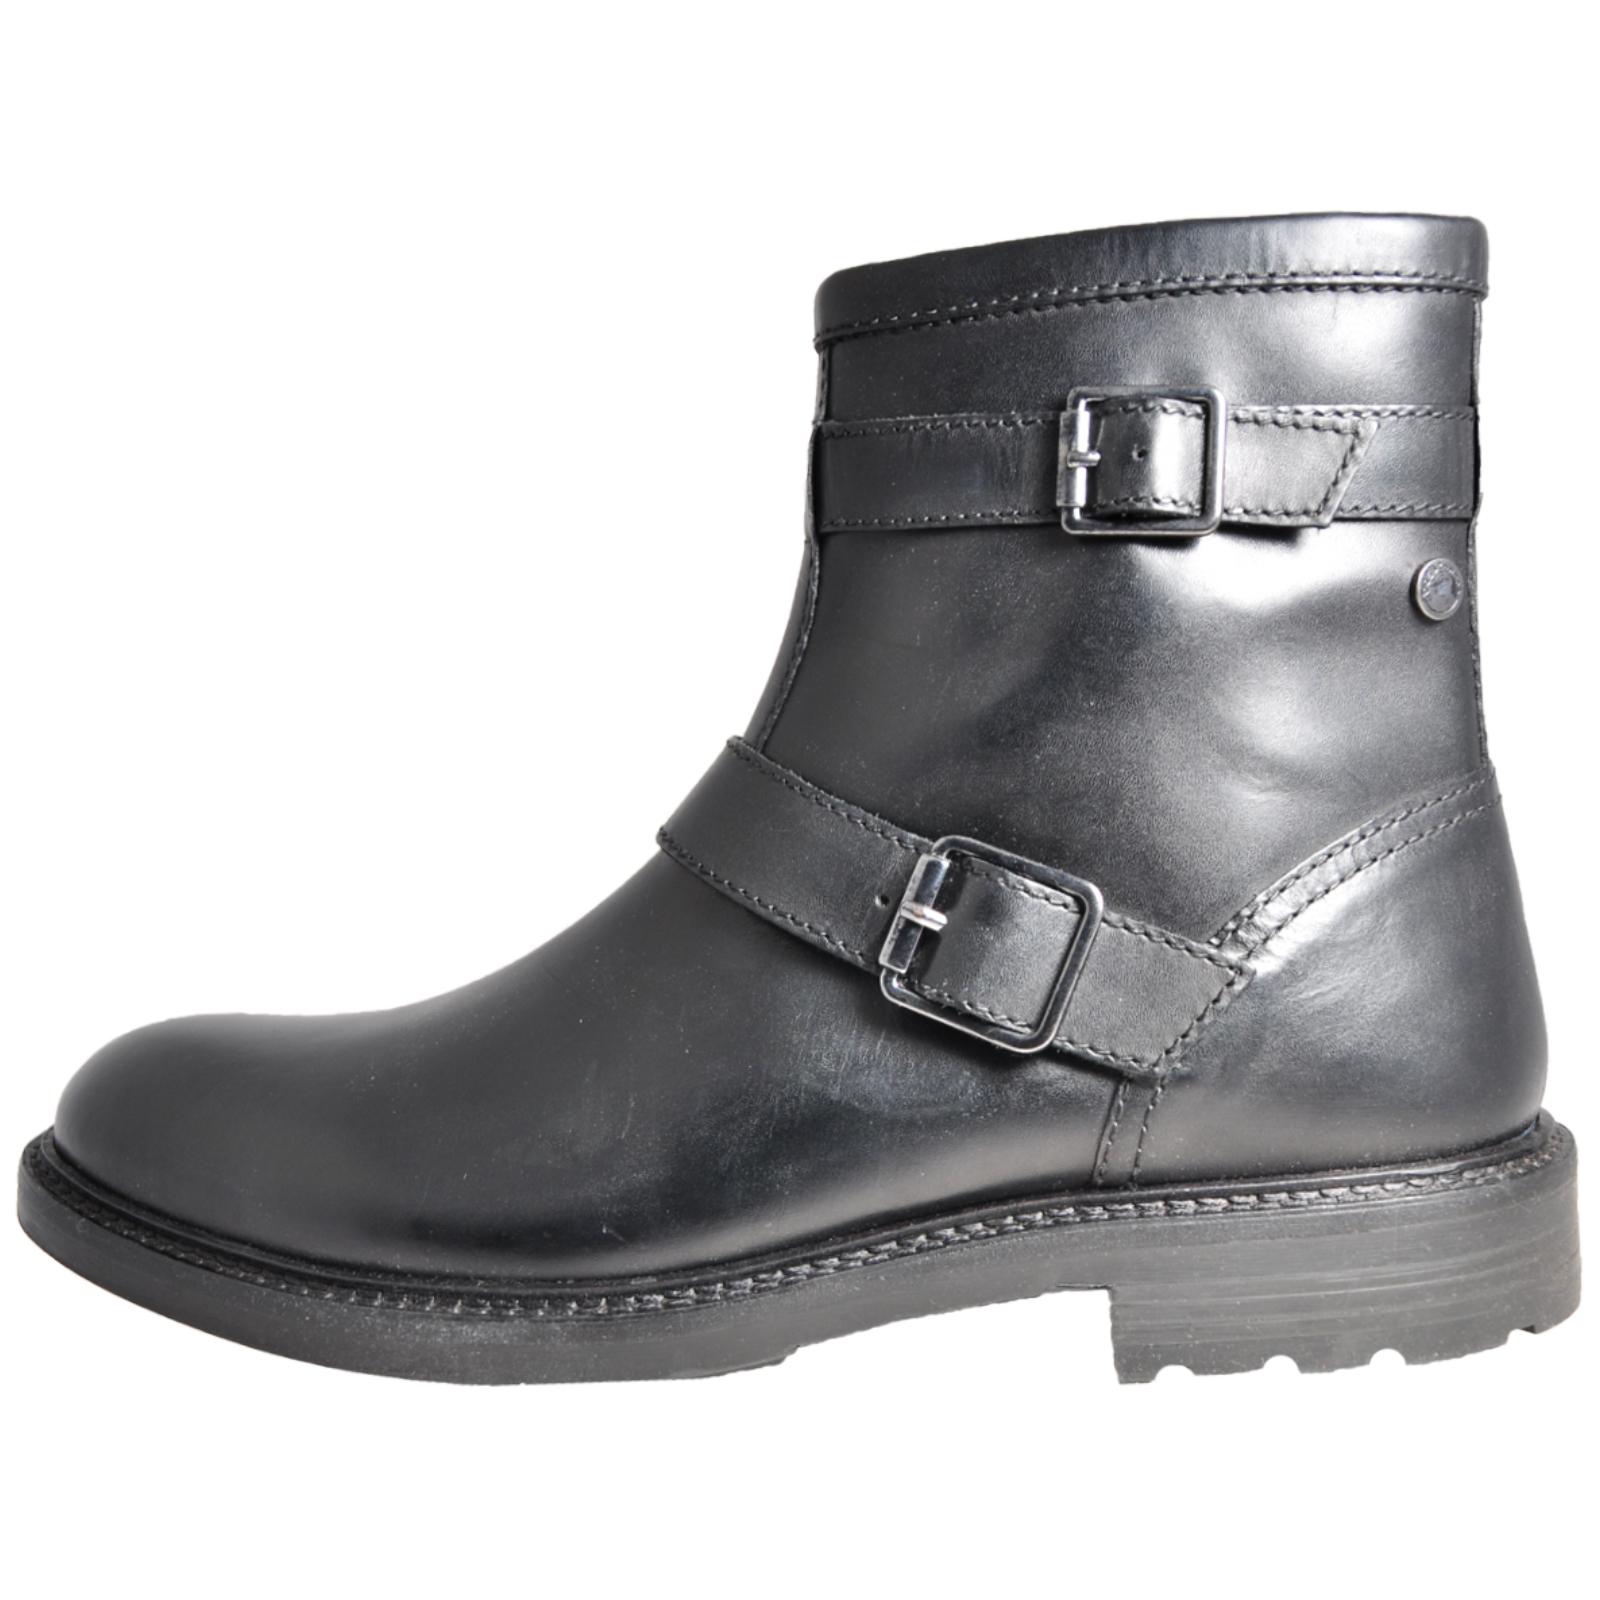 b574bf3572f Details about Base London Ortiz Men's Leather Ankle Biker Boots Black  (SAMPLE) UK 8 Only